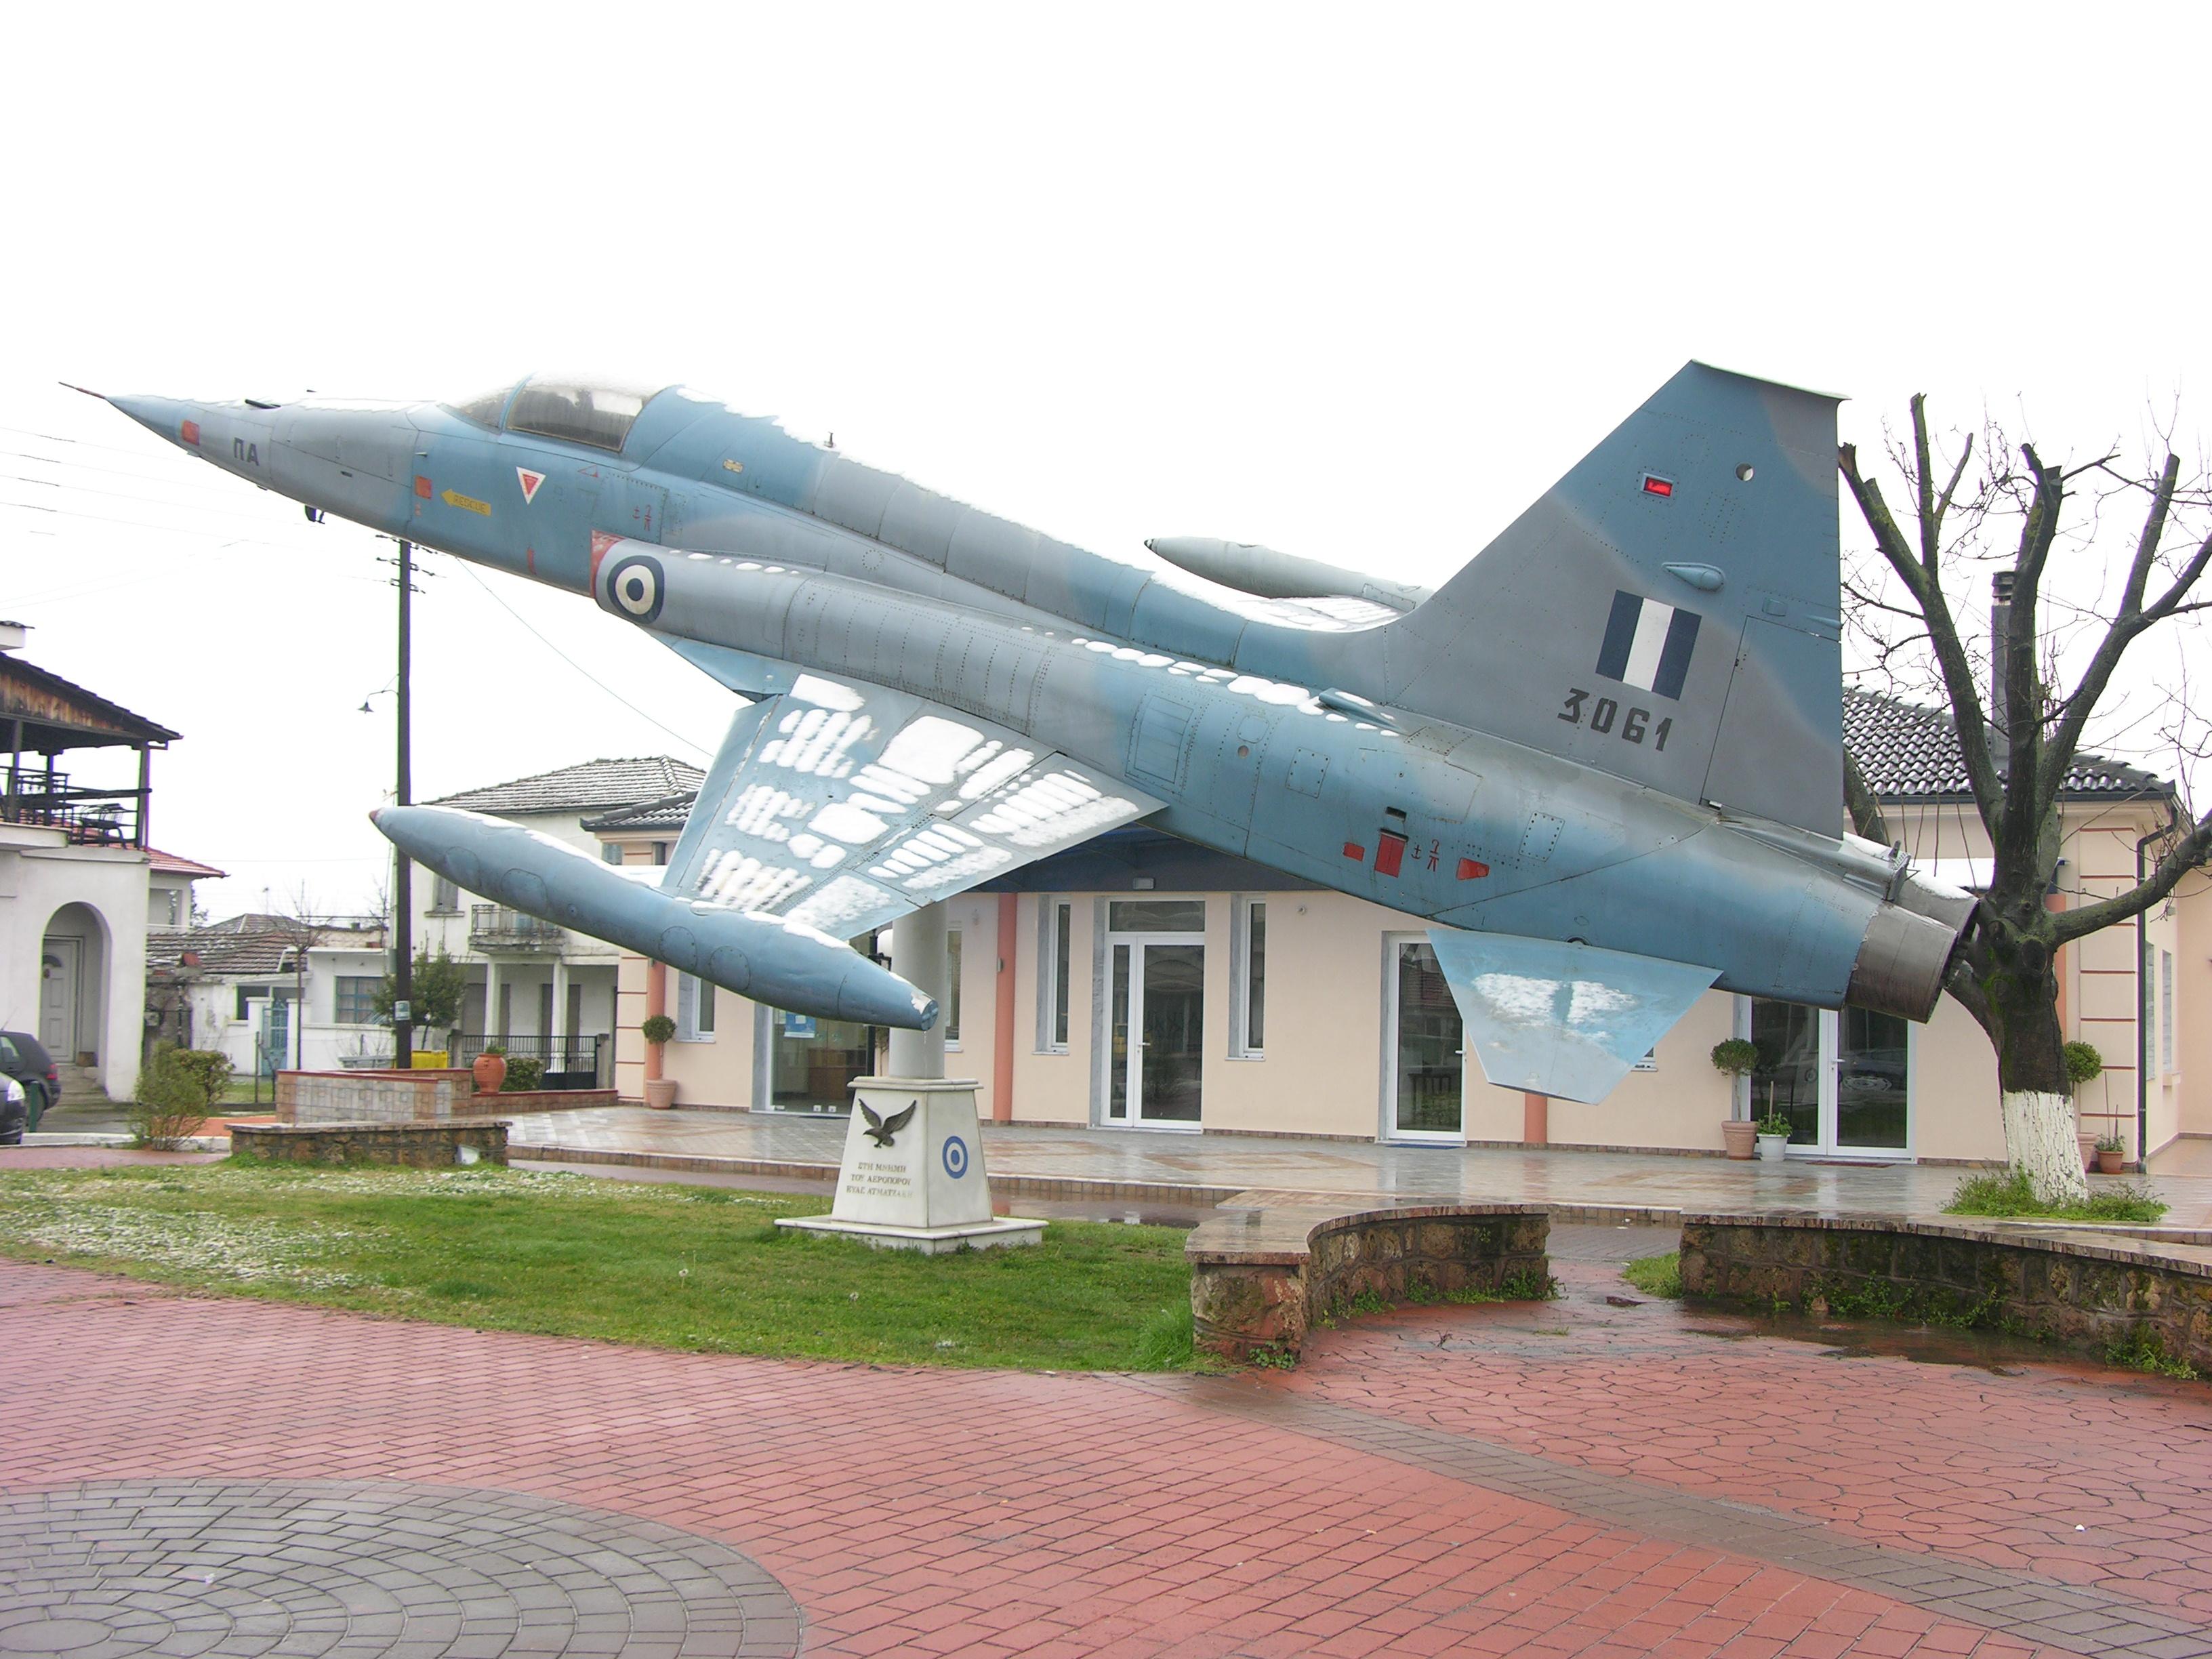 File:NF-5A 3061 at Kariotisa (near Edessa) commemorates an ...